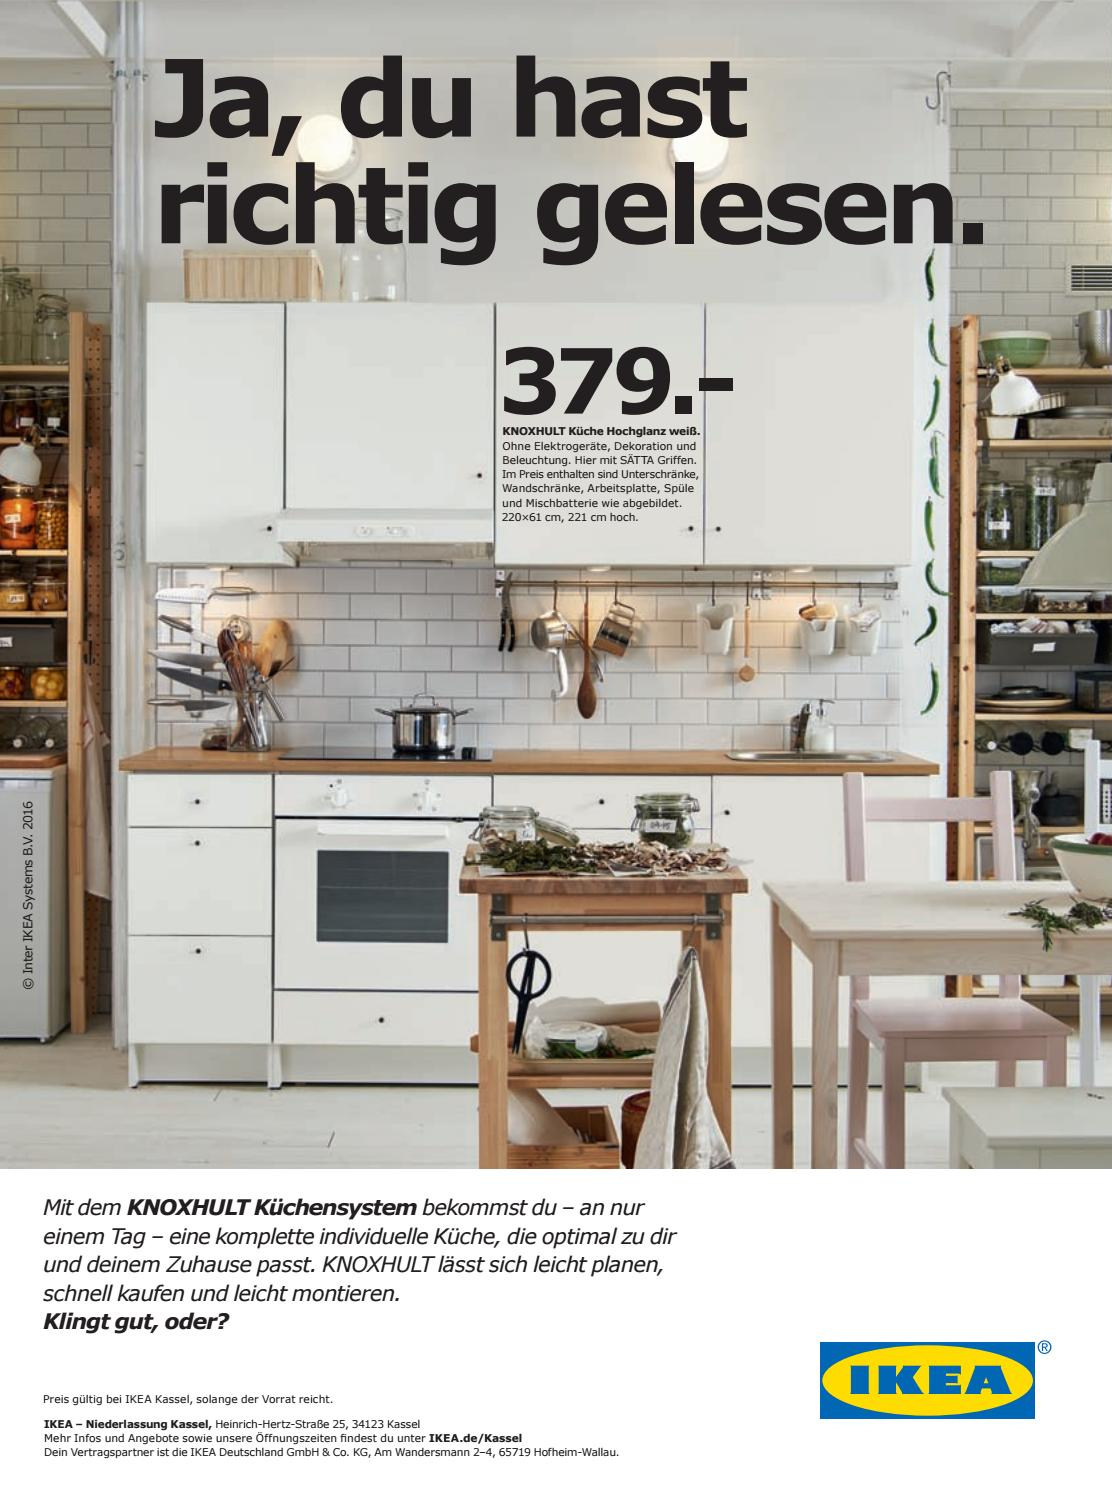 Http Www Ikea Com Ms De De Img Local Store Info Oldenburg Pdf Files Wochenangebot 48 Pdf